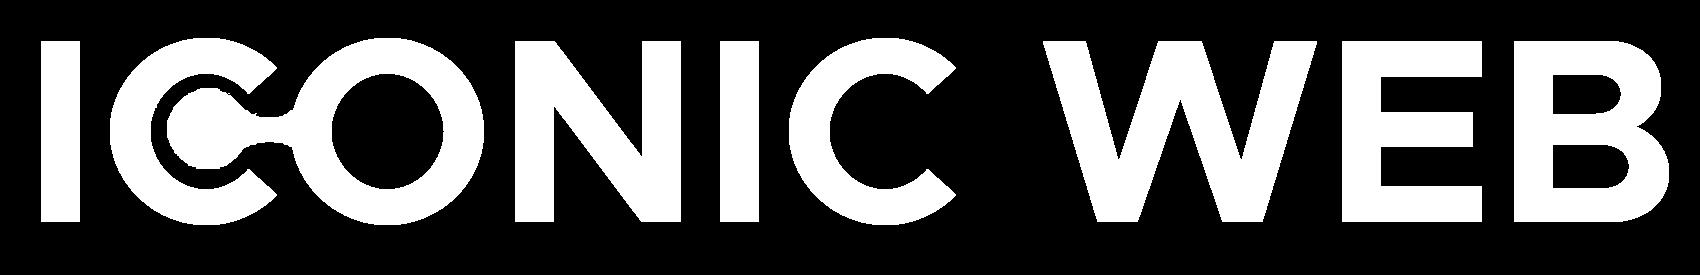 Iconic Web Headquarters